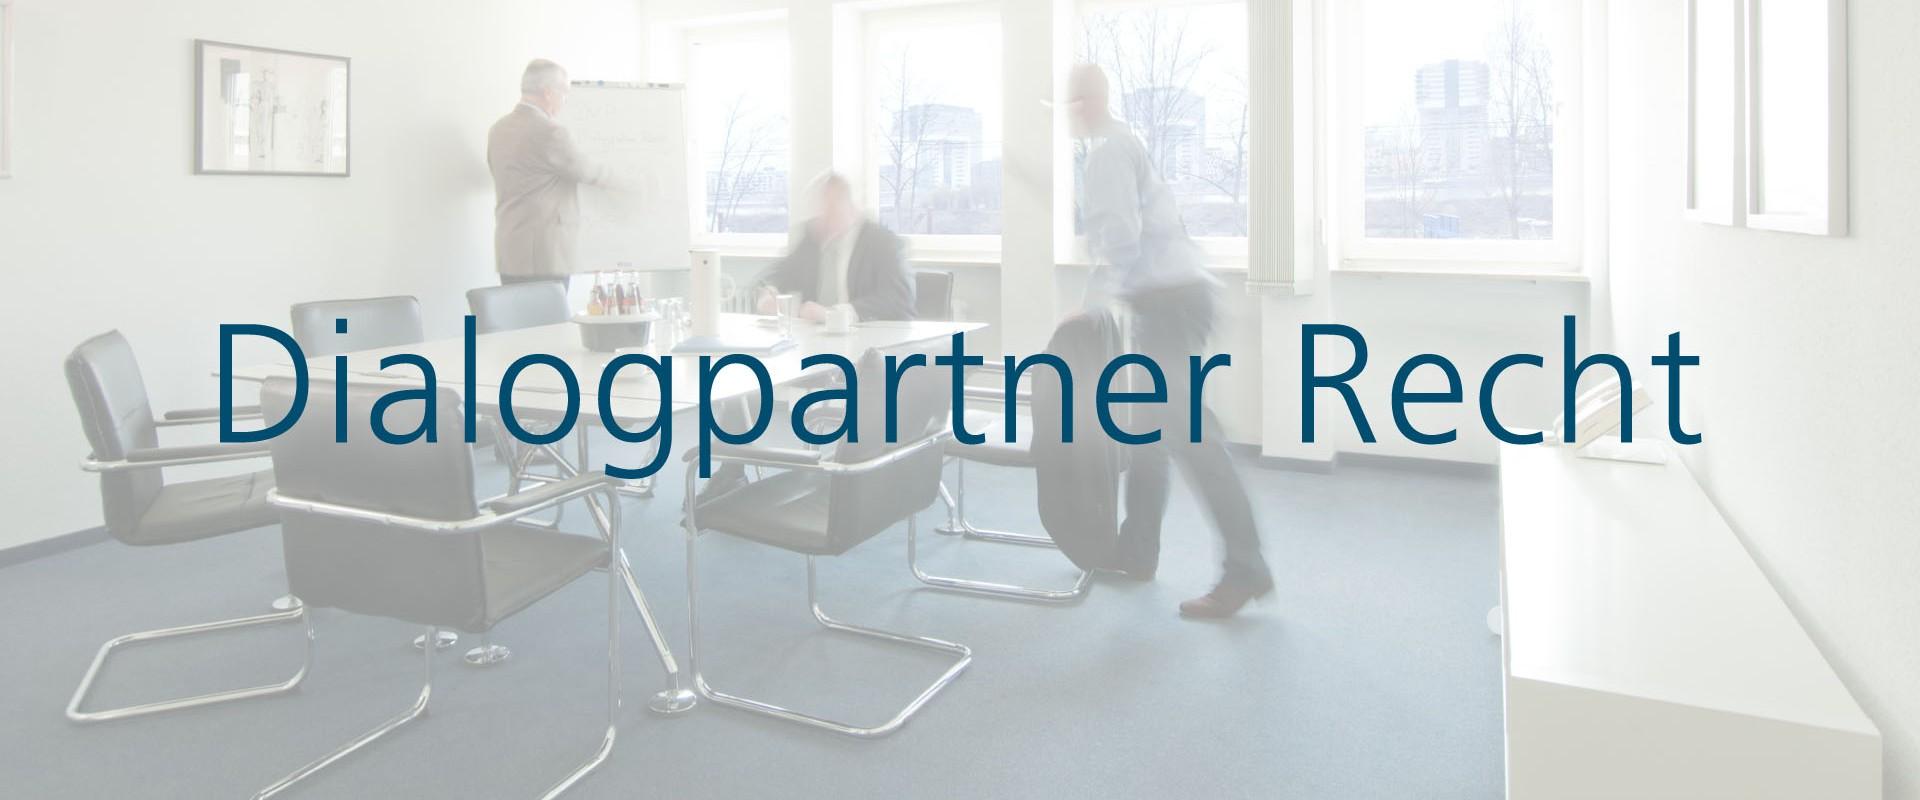 Dialogpartner